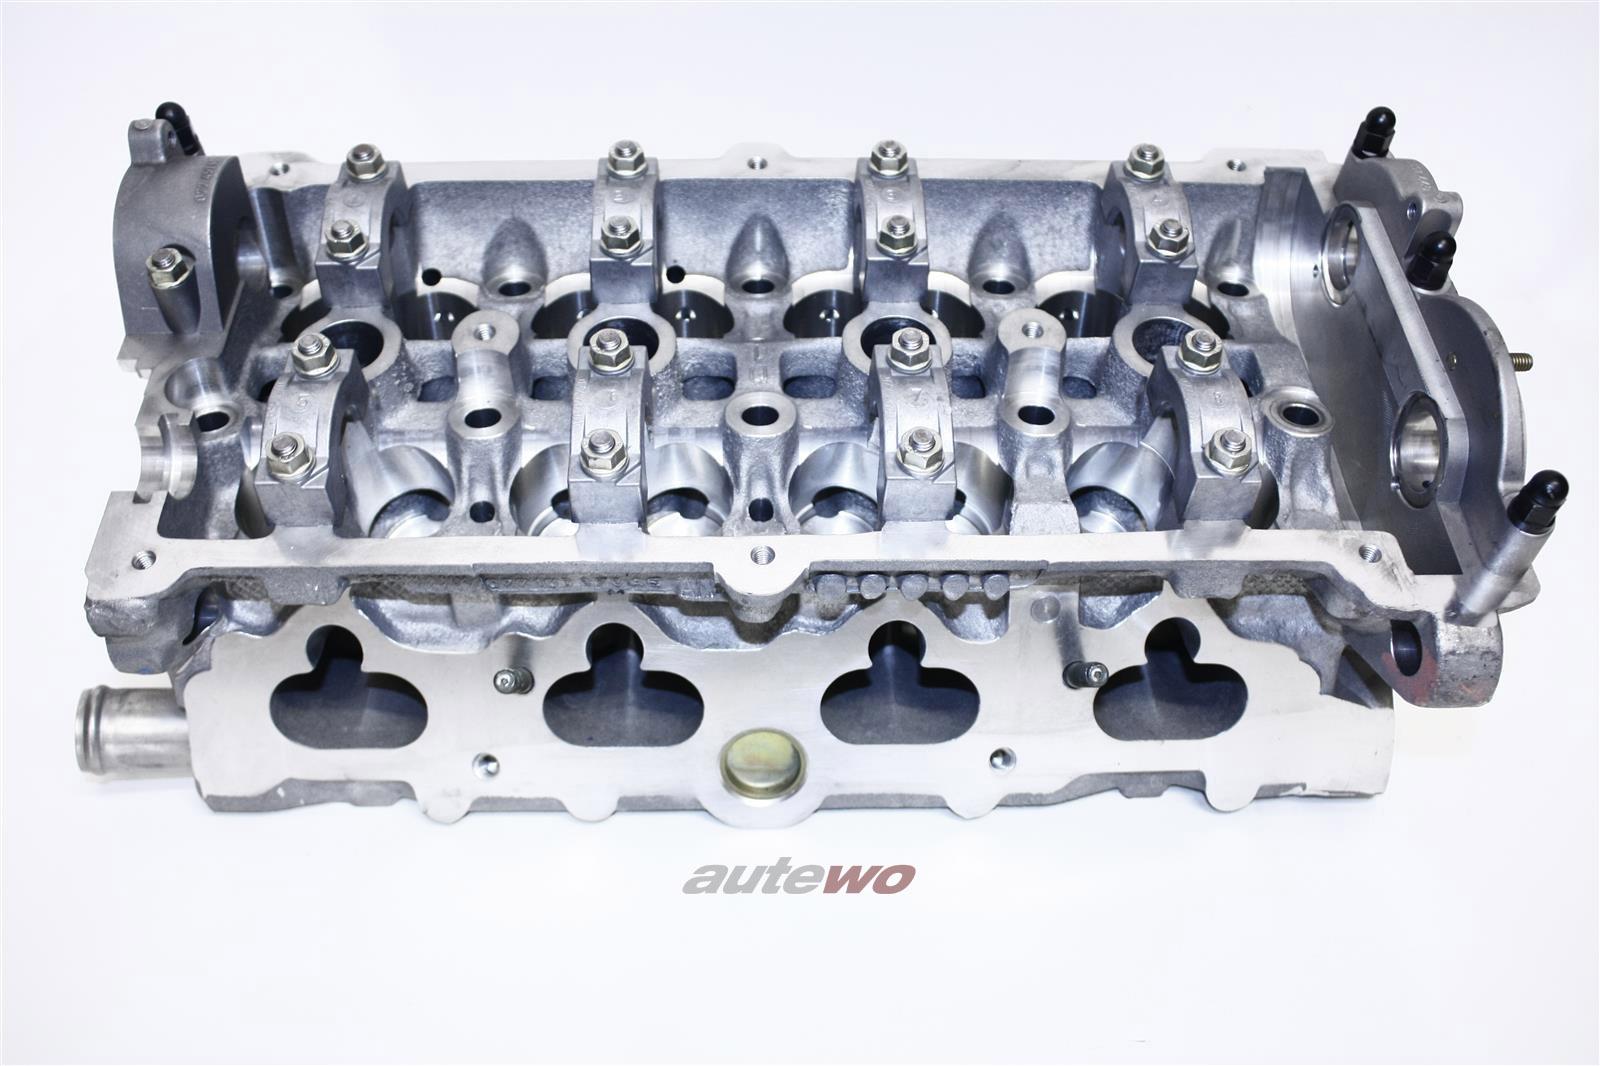 077103351F 077103373AE NEU Audi S6 C4/A8 D2 4.2l 8 Zyl. Zylinderkopf Rechts